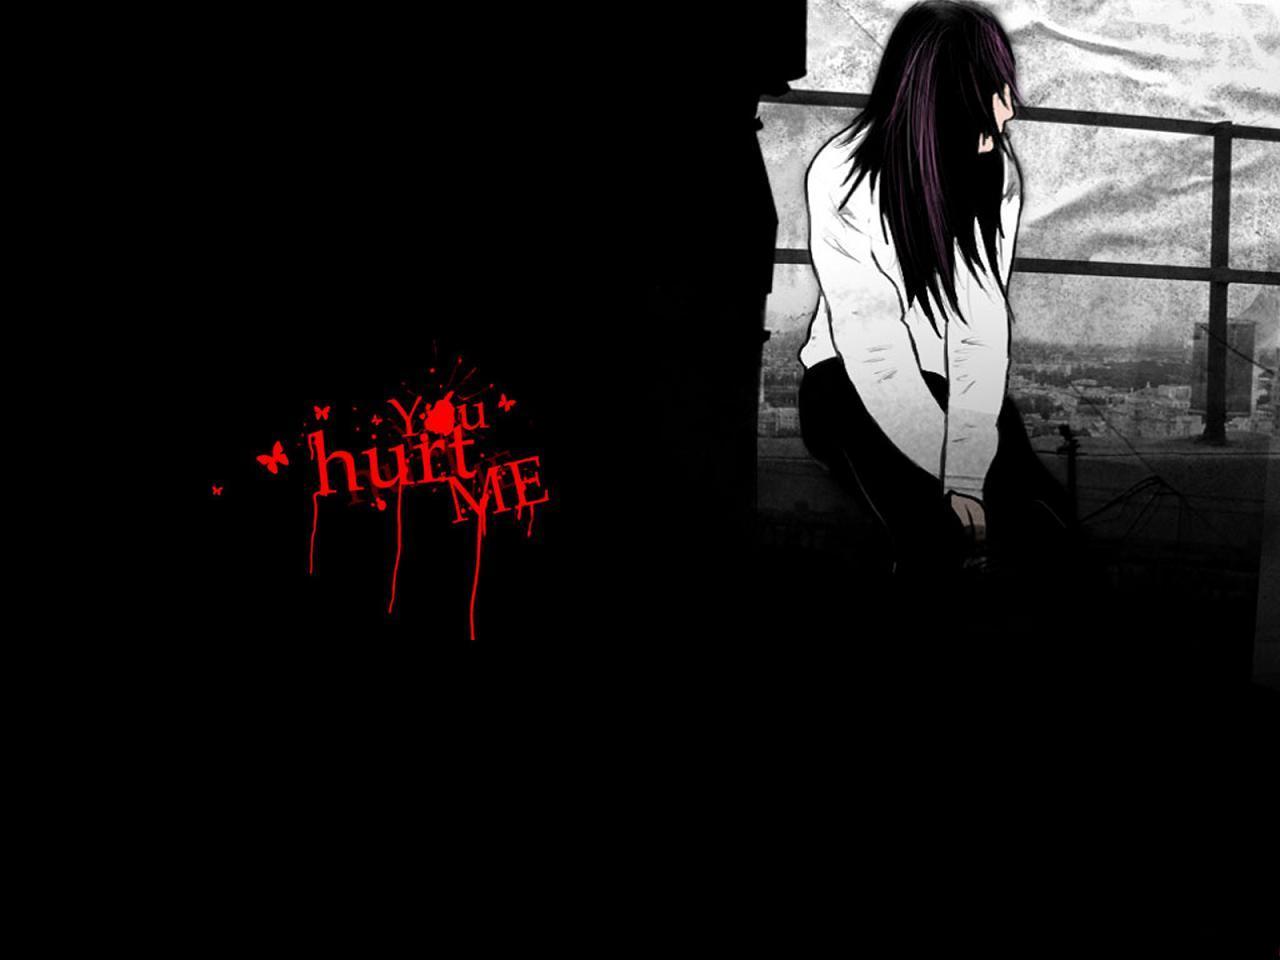 http://1.bp.blogspot.com/_WmfnL79SyIE/TEANZAAiH_I/AAAAAAAACmA/f-RiU1v6qbs/s1600/Alone_emo_wow_wallpaper.jpg